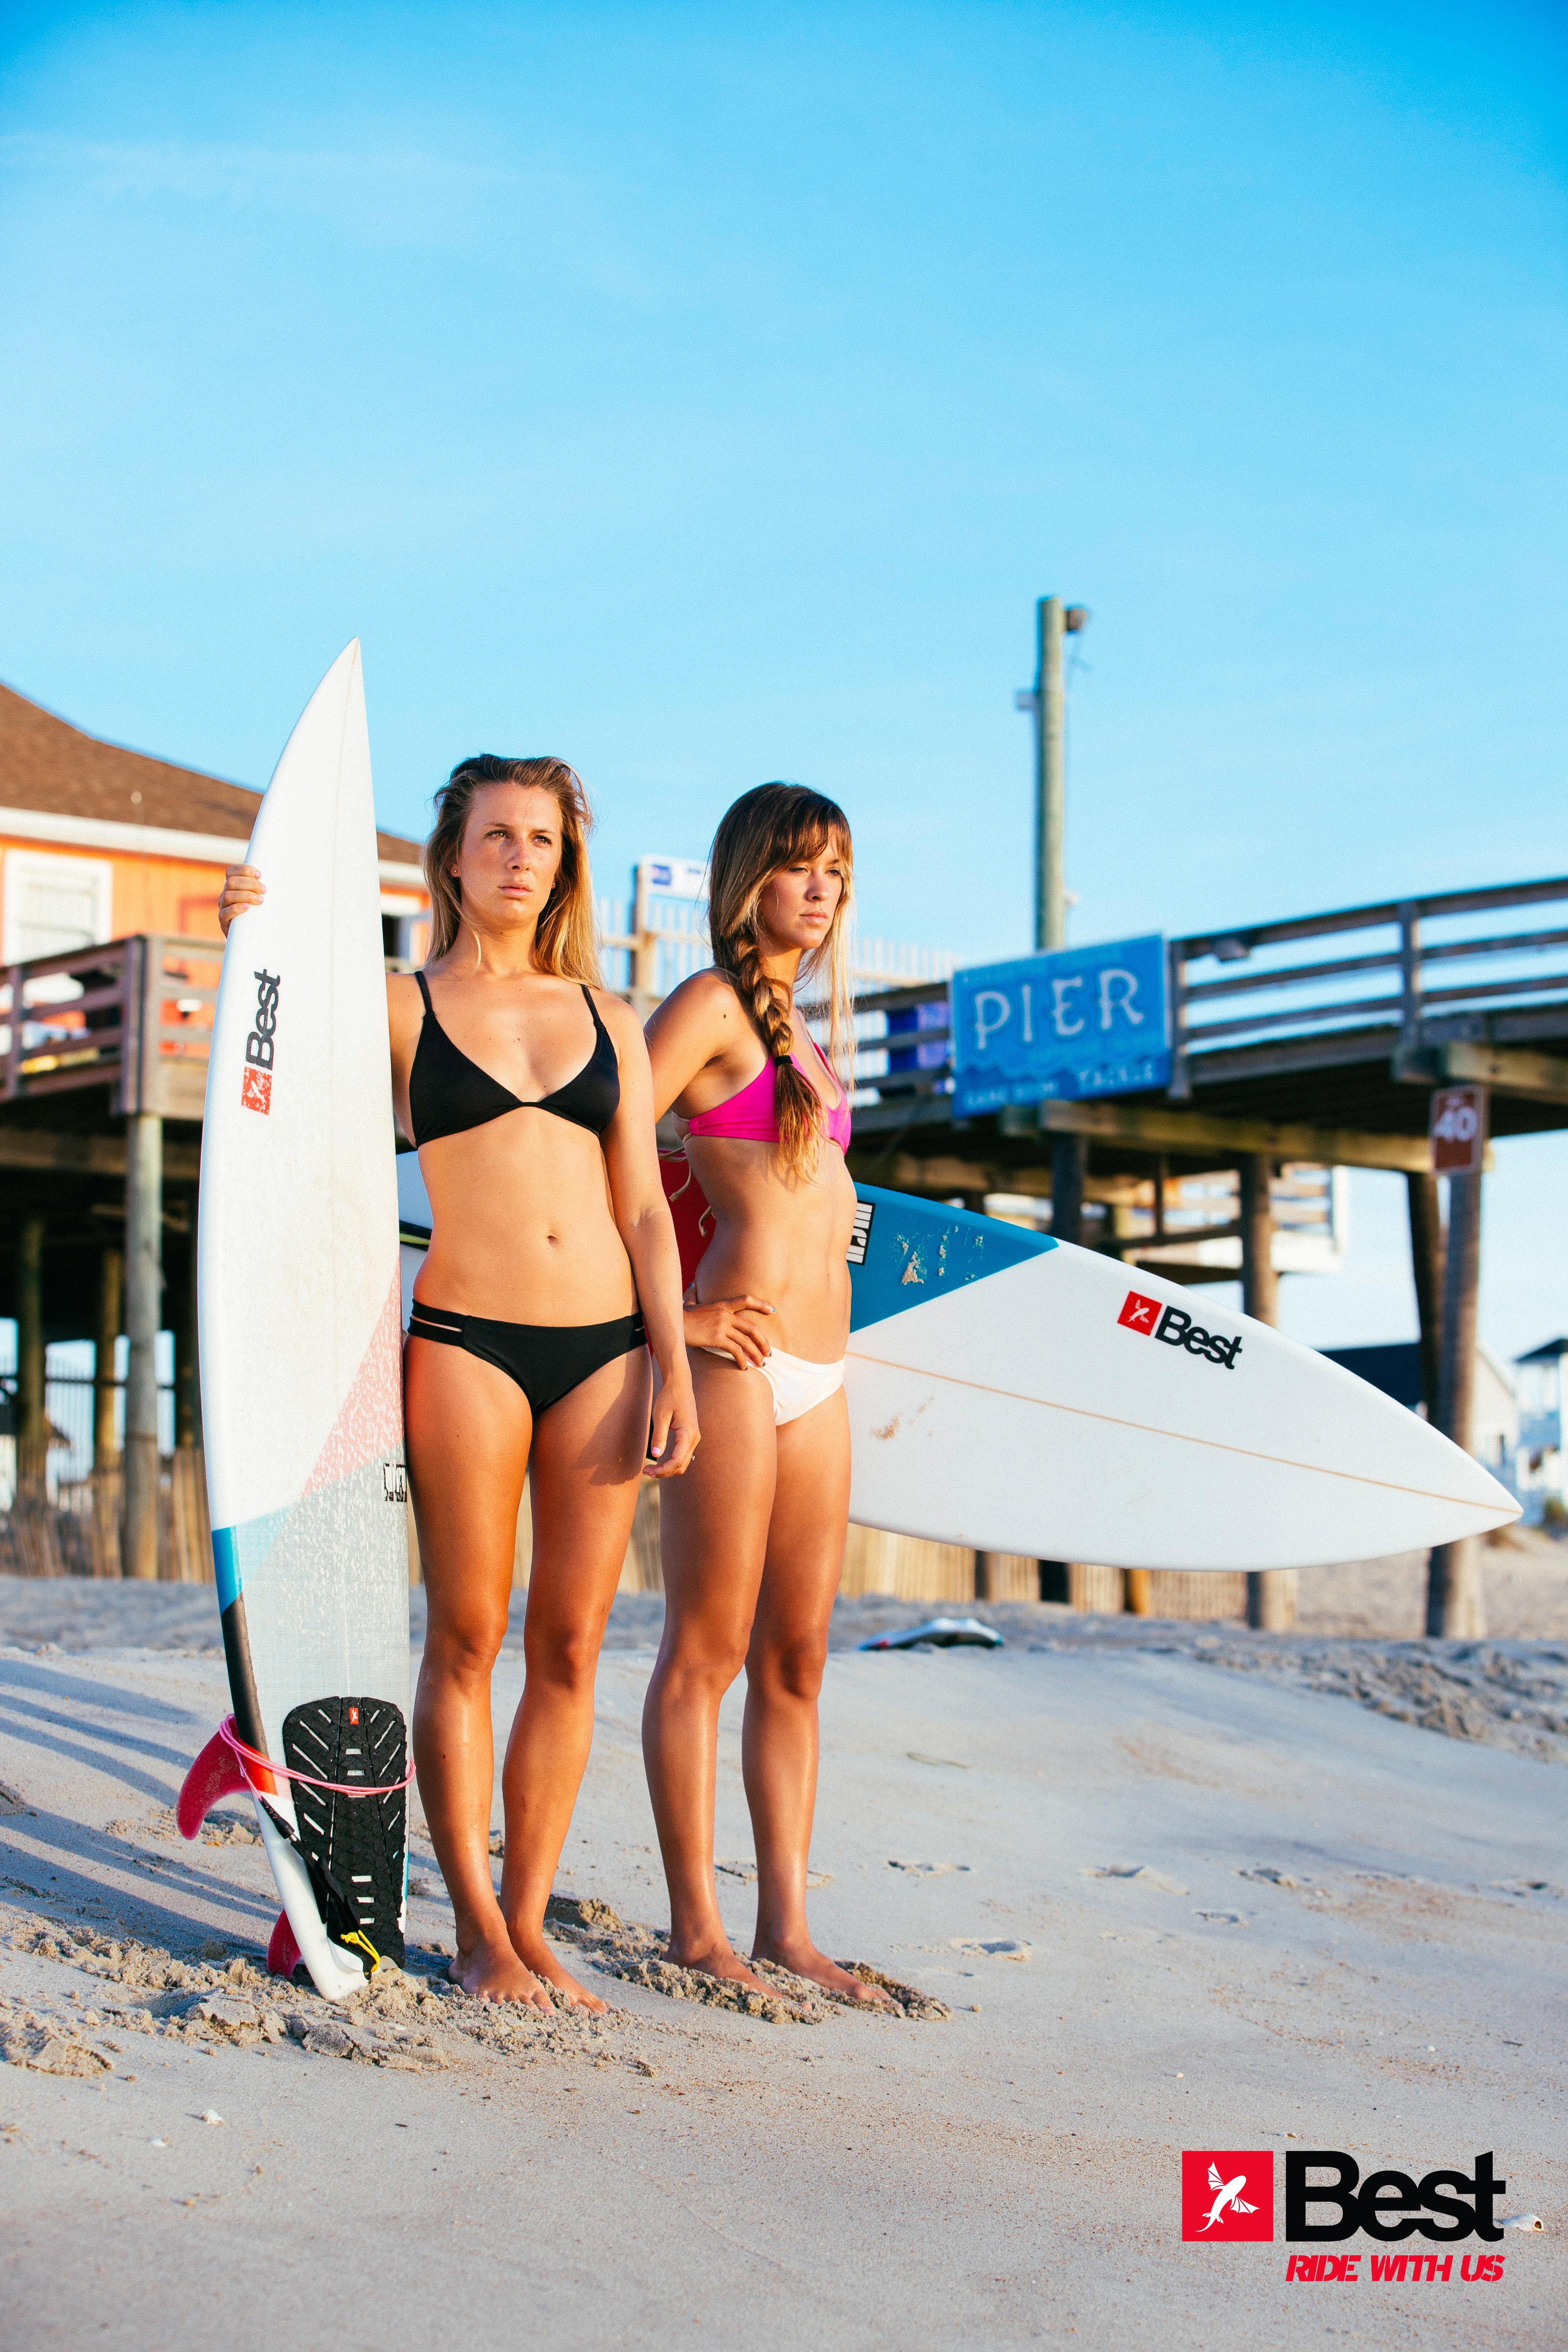 kitesurf wallpaper image - Two Best Kiteboarding kitechicks in bikini with surfboards looking to take a ride - in resolution: Original 3456 X 5184